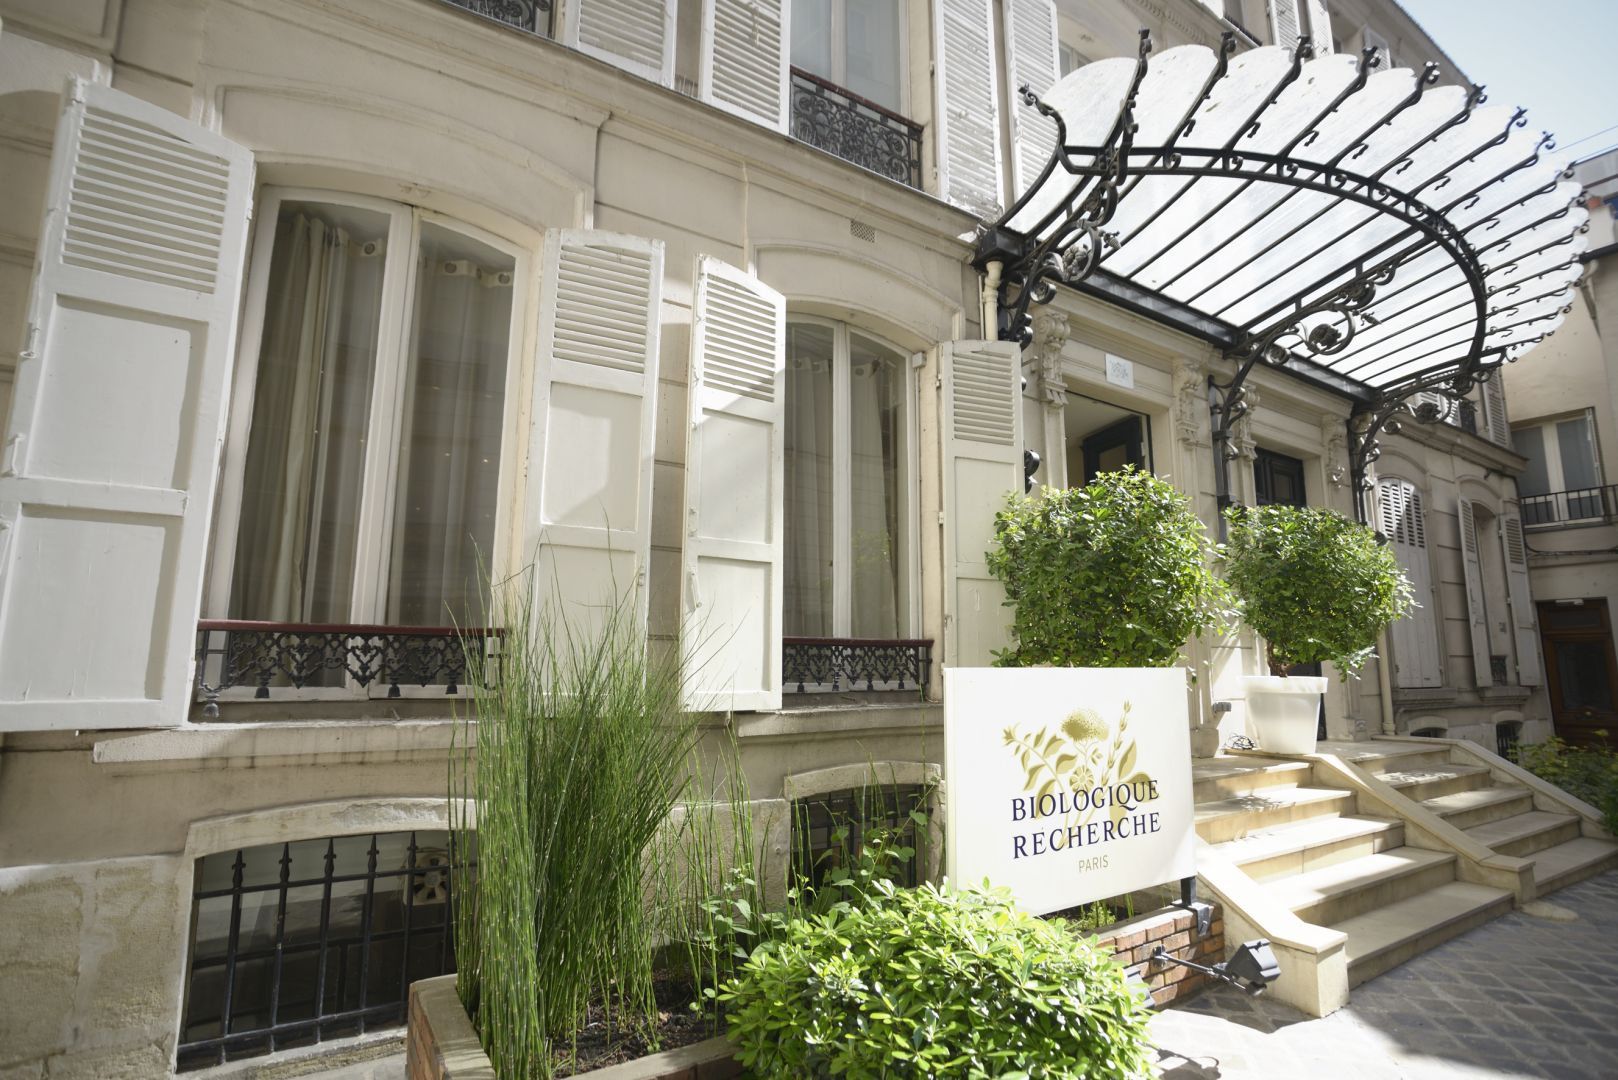 ambassade de la beaute